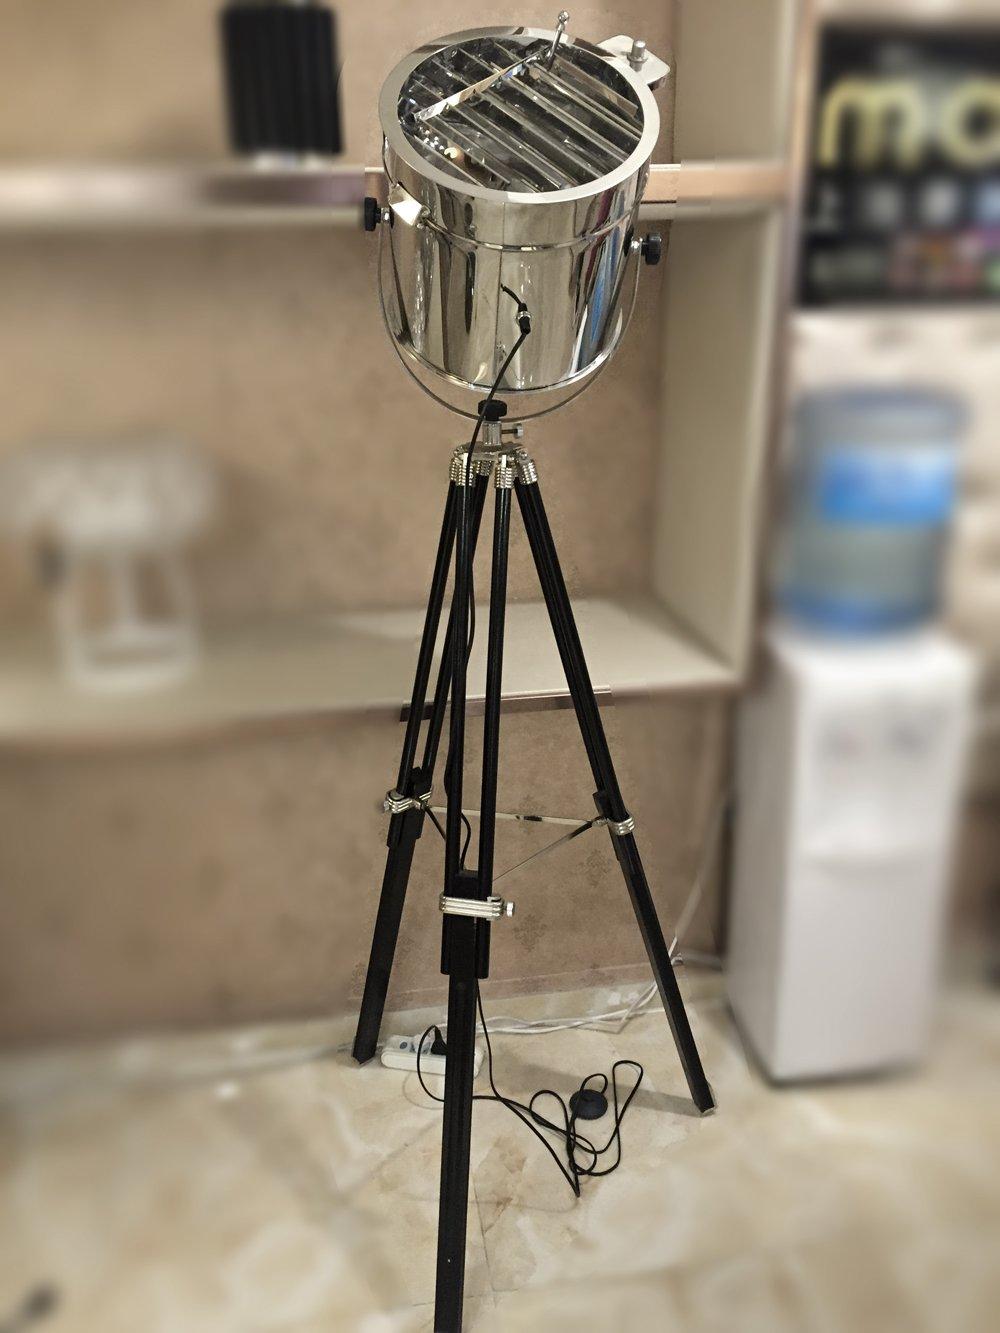 Royal master sealight floor lamp - British Royal Master Stainless Steel Wood Tripod Floor Lamp Amazon Com